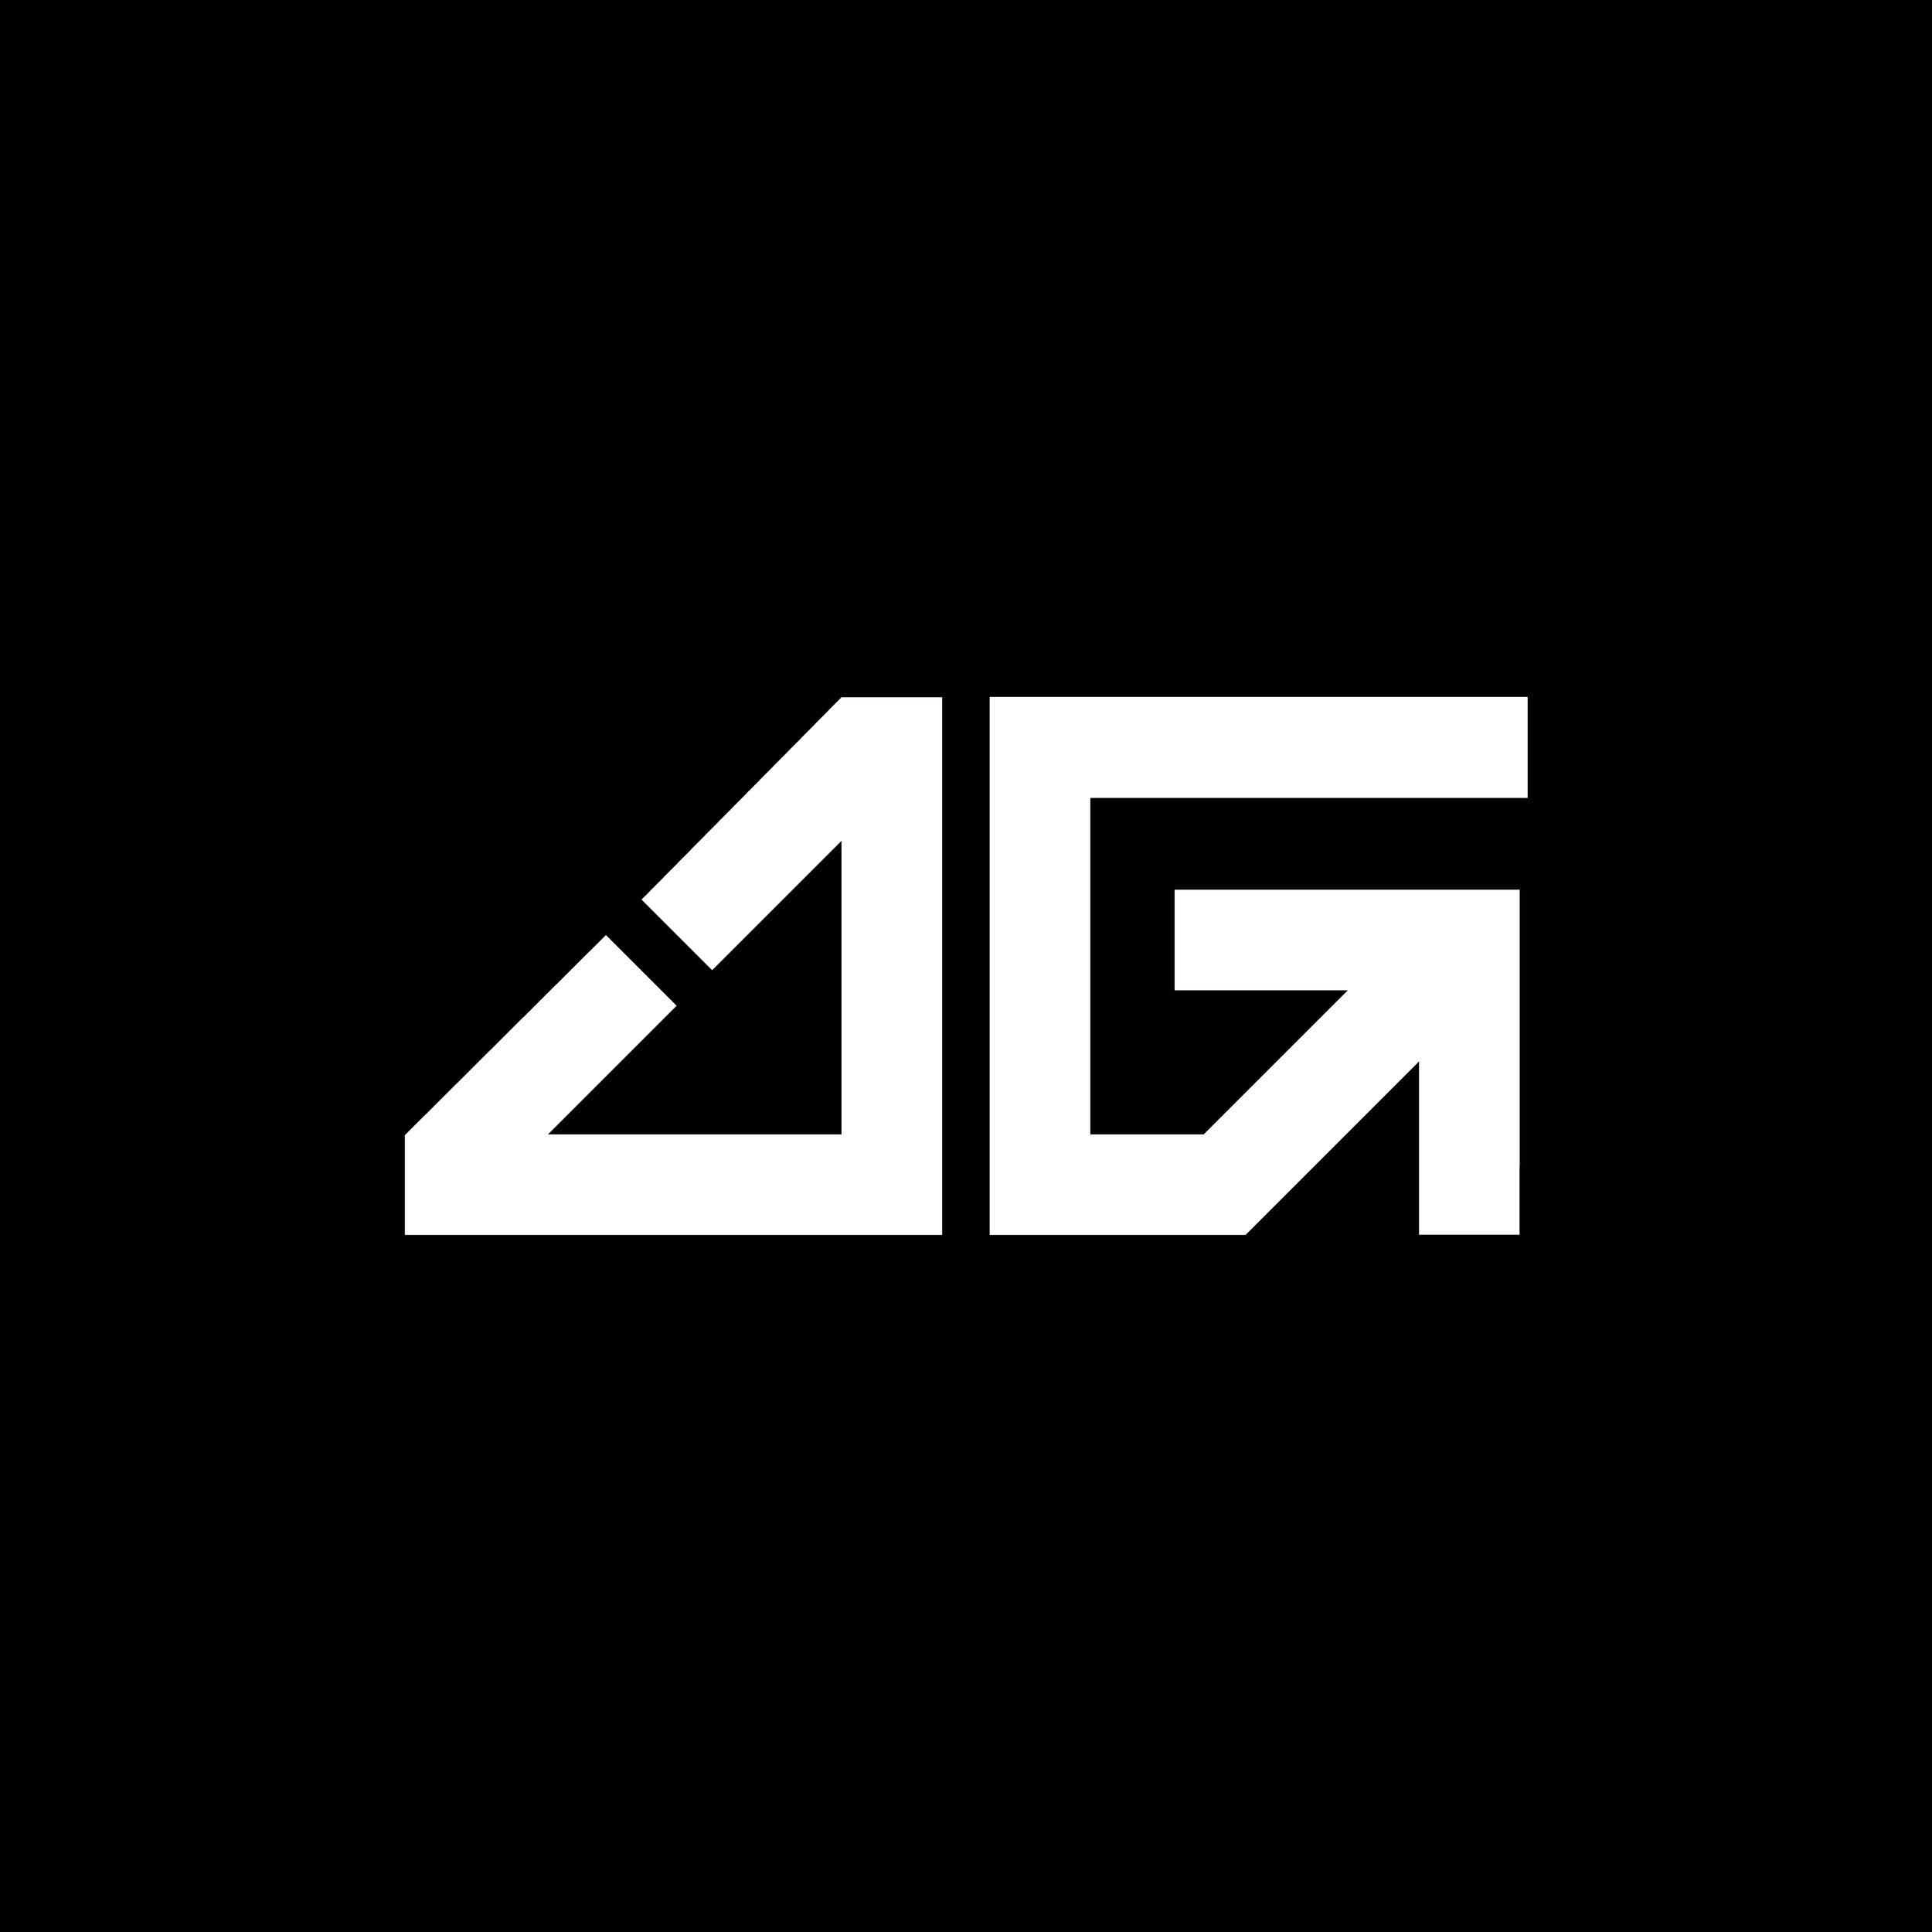 AG_LOGO_12.png